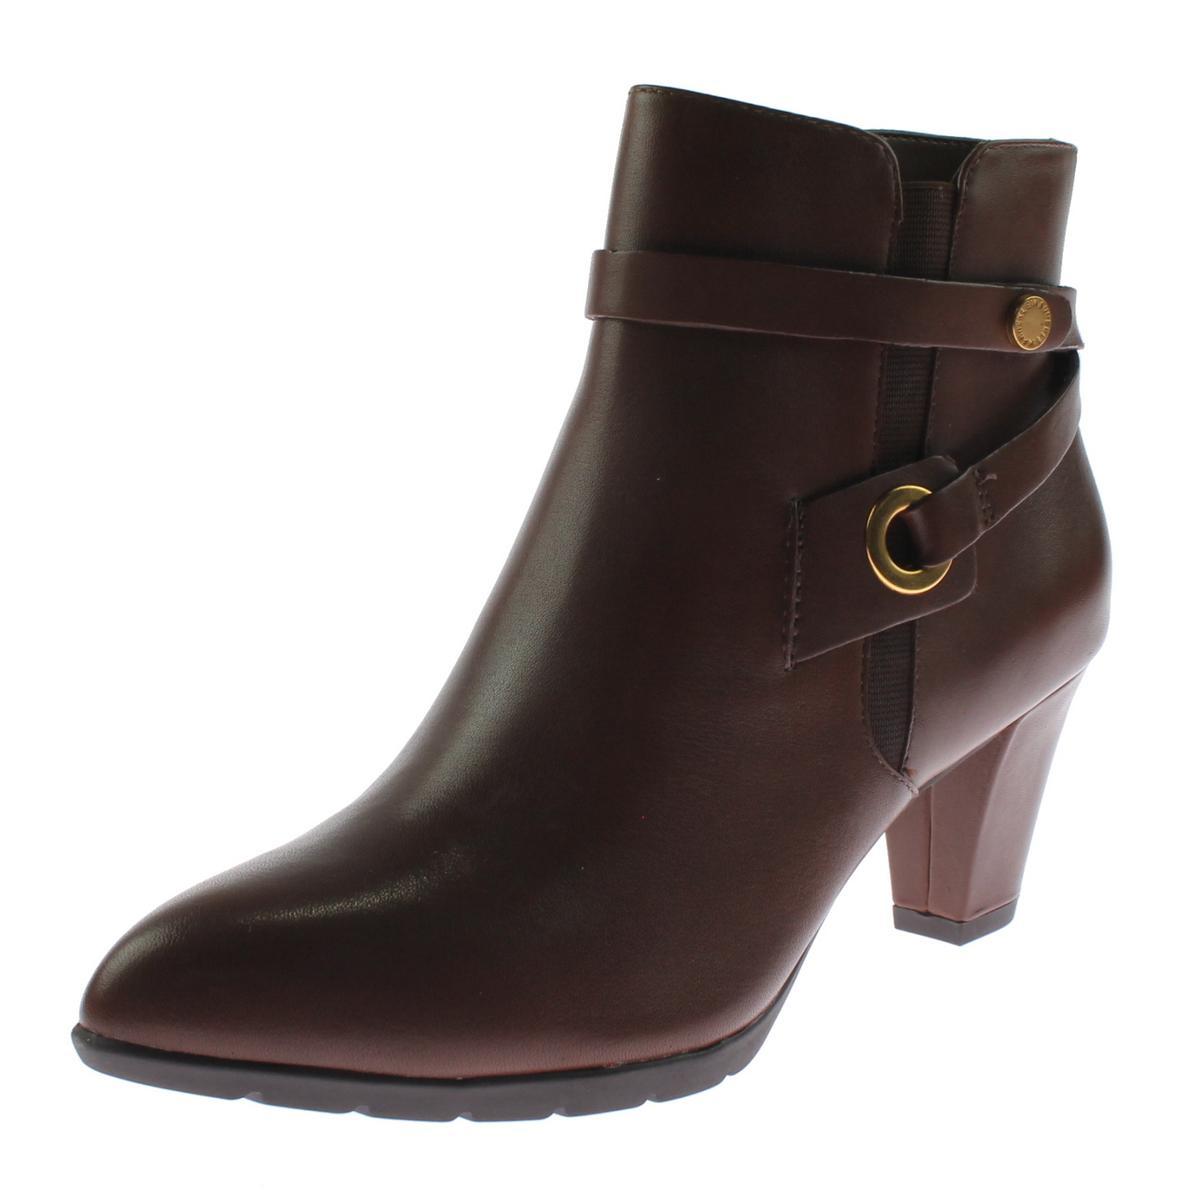 Anne Klein Damenschuhe Chelsey Leder Pumps Ankle Stiefel Schuhes BHFO 2528